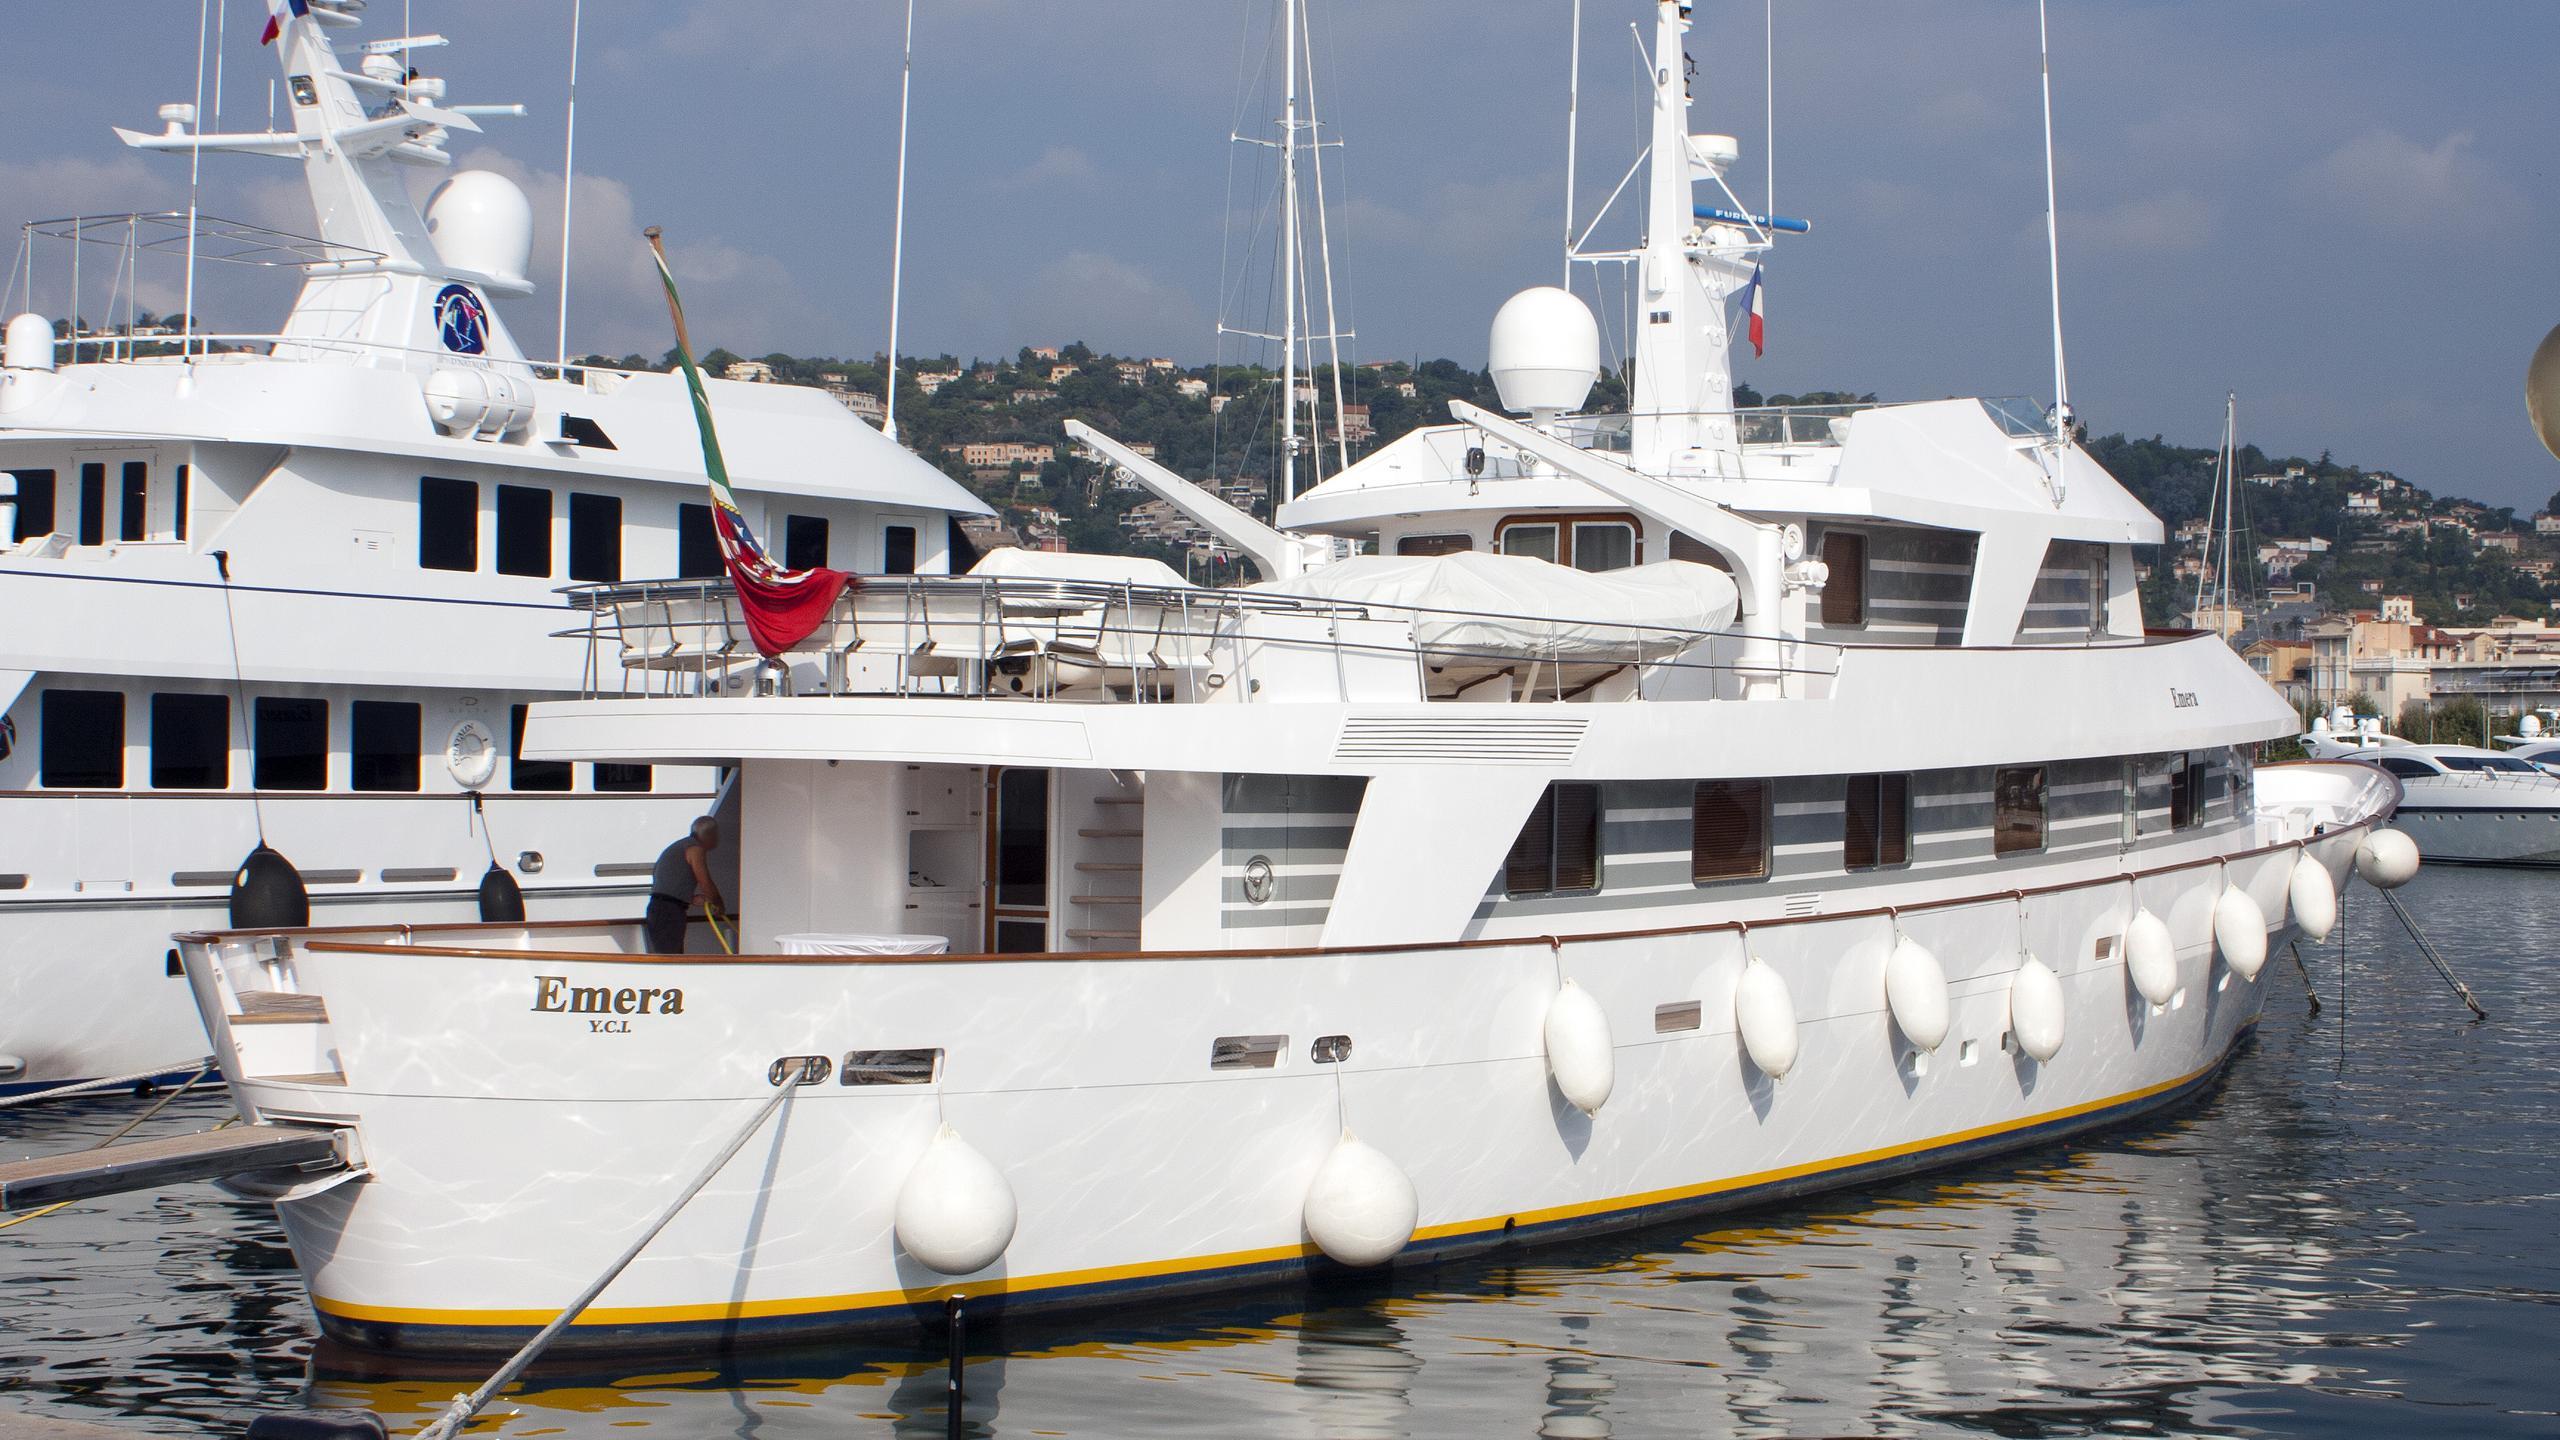 emera-motor-yacht-camper-nicholsons-1974-40m-profile